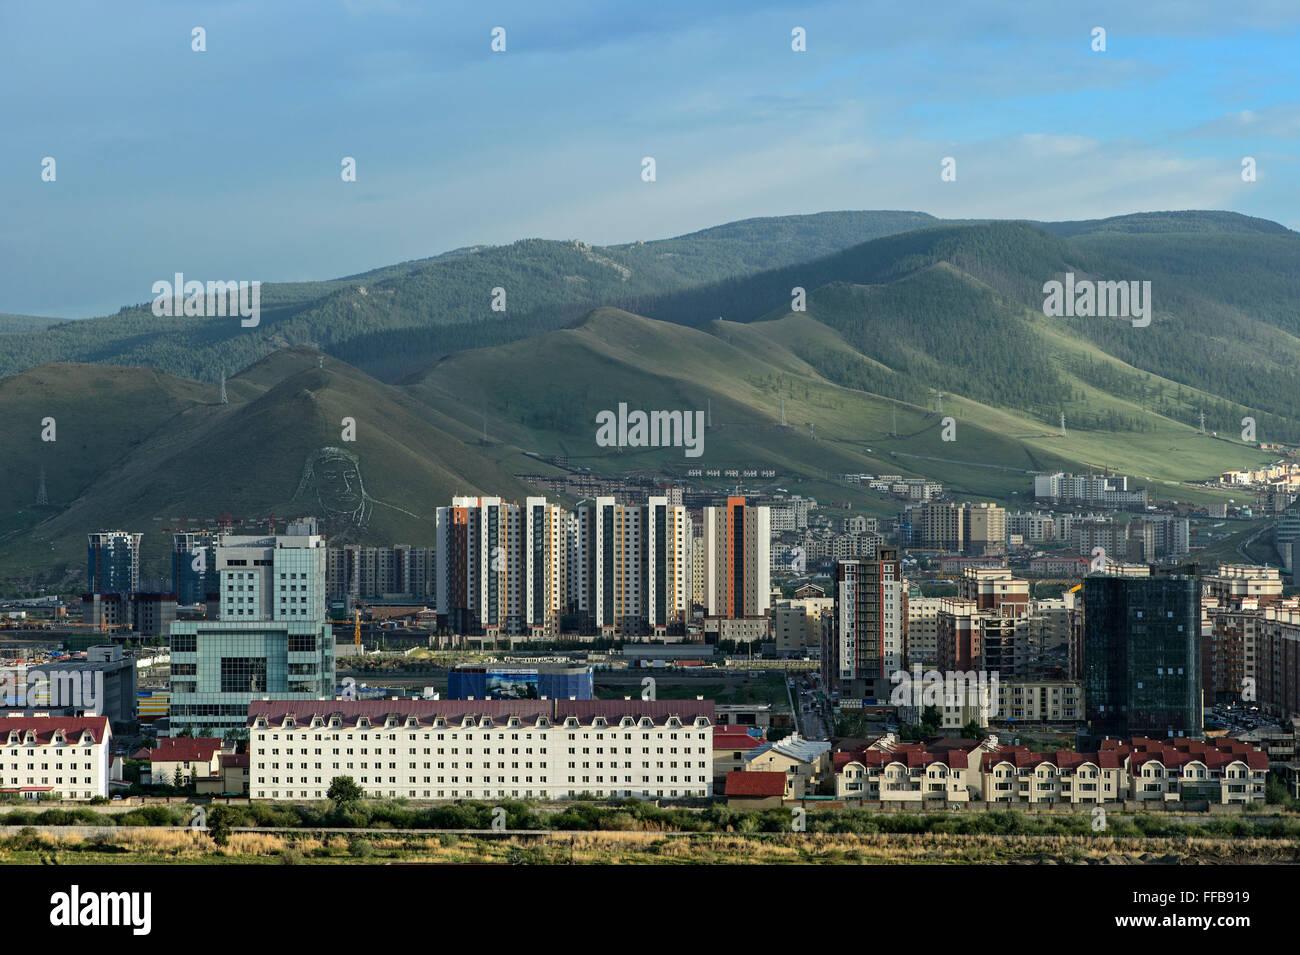 Blick auf moderne Wohnviertel hinter Bergen Bogd Khan mit Porträt von Dschingis Khan, Ulan Bator, Mongolei Stockbild